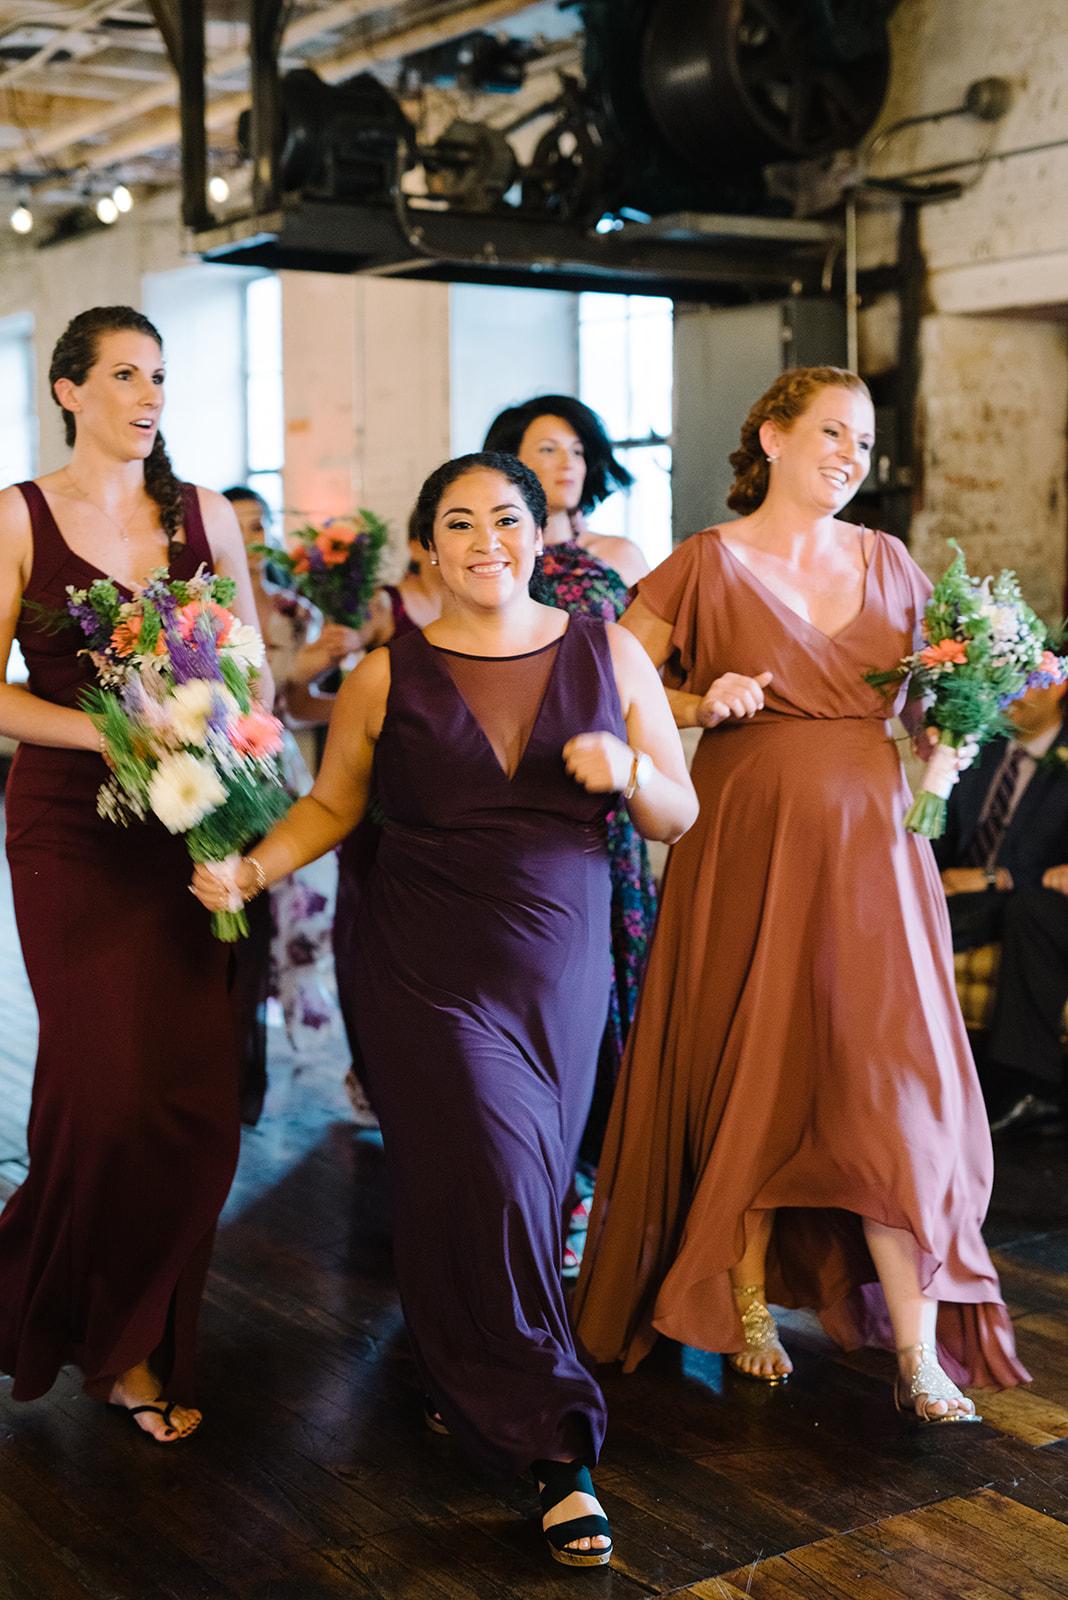 Art Factory Wedding- Industrial Chic- Audrey+Ryan- Paterson NJ- Olivia Christina Photo (53).jpg